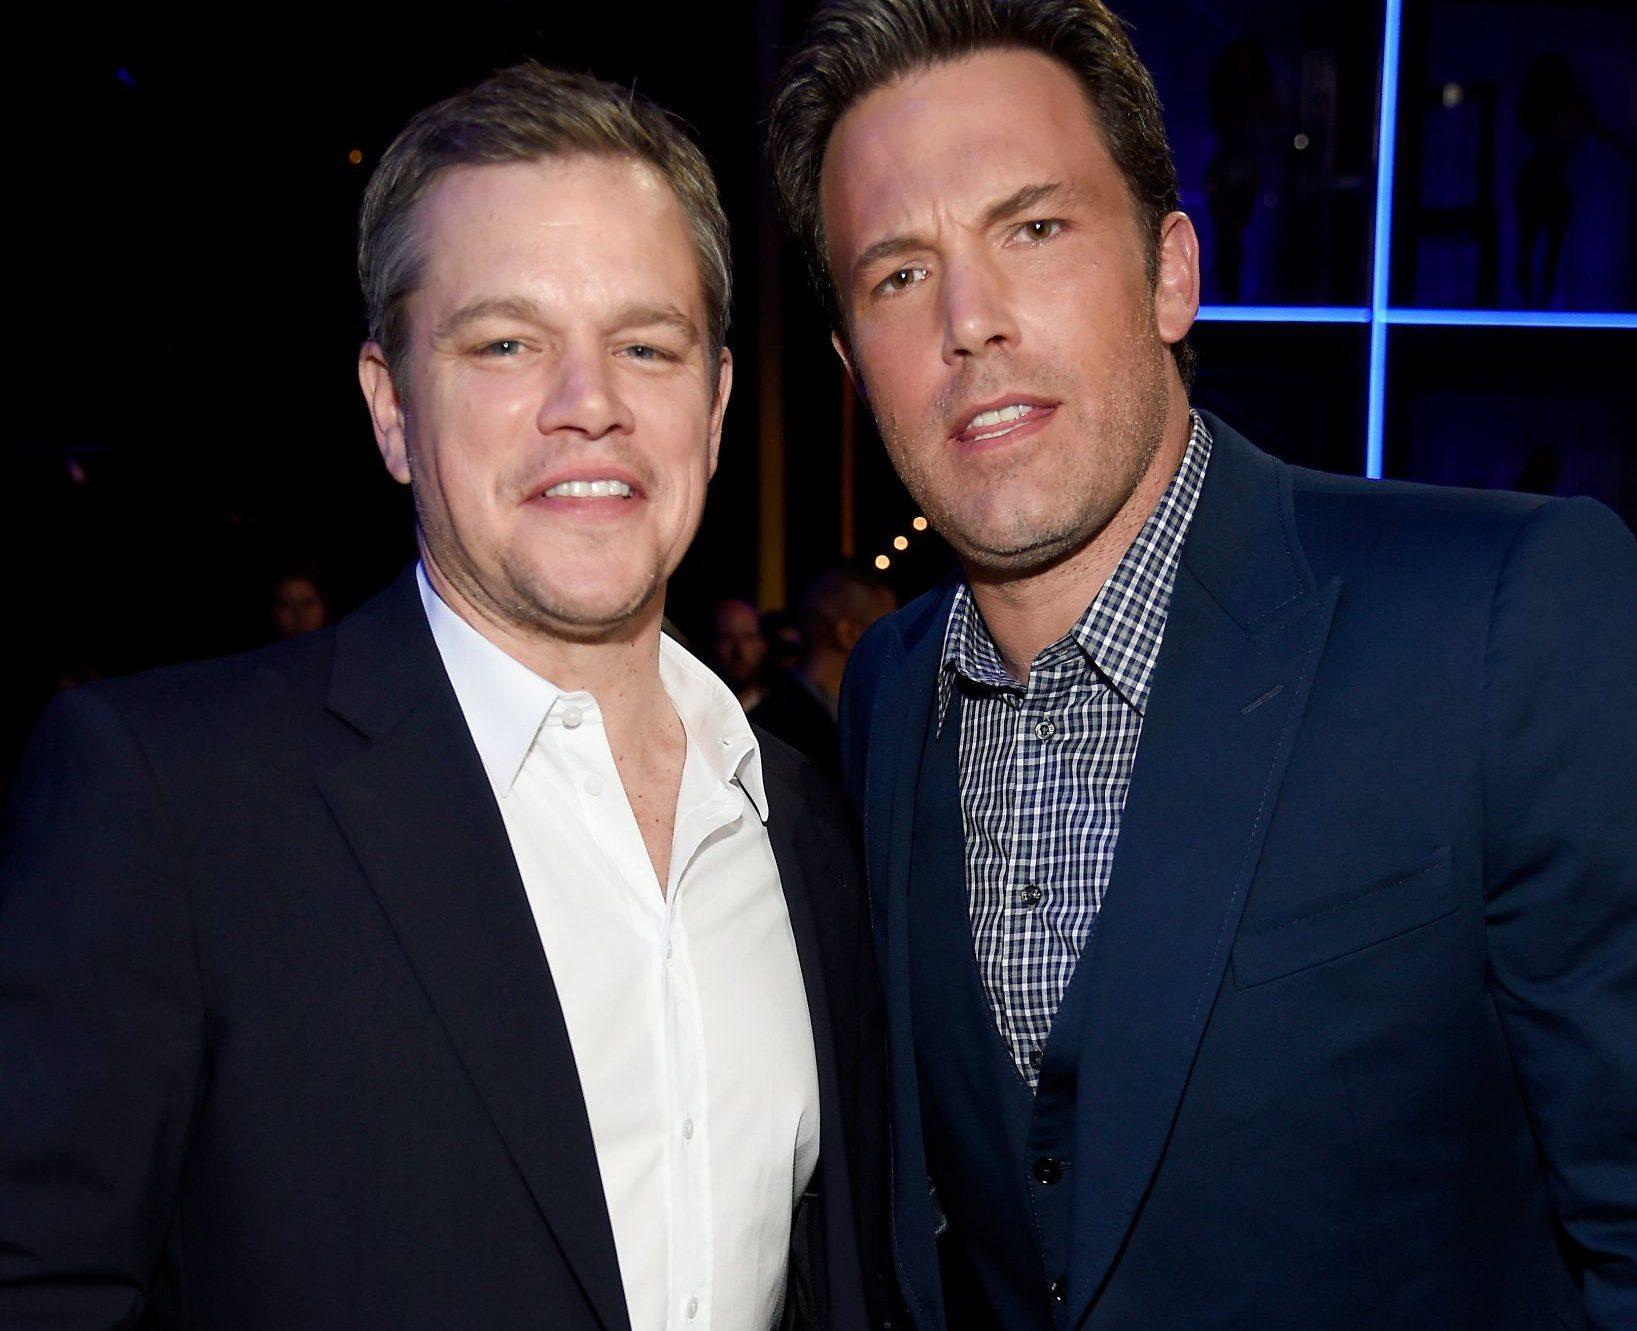 Ben Affleck and Matt Damon reunite their bromance for new crime drama TV series City on a Hill